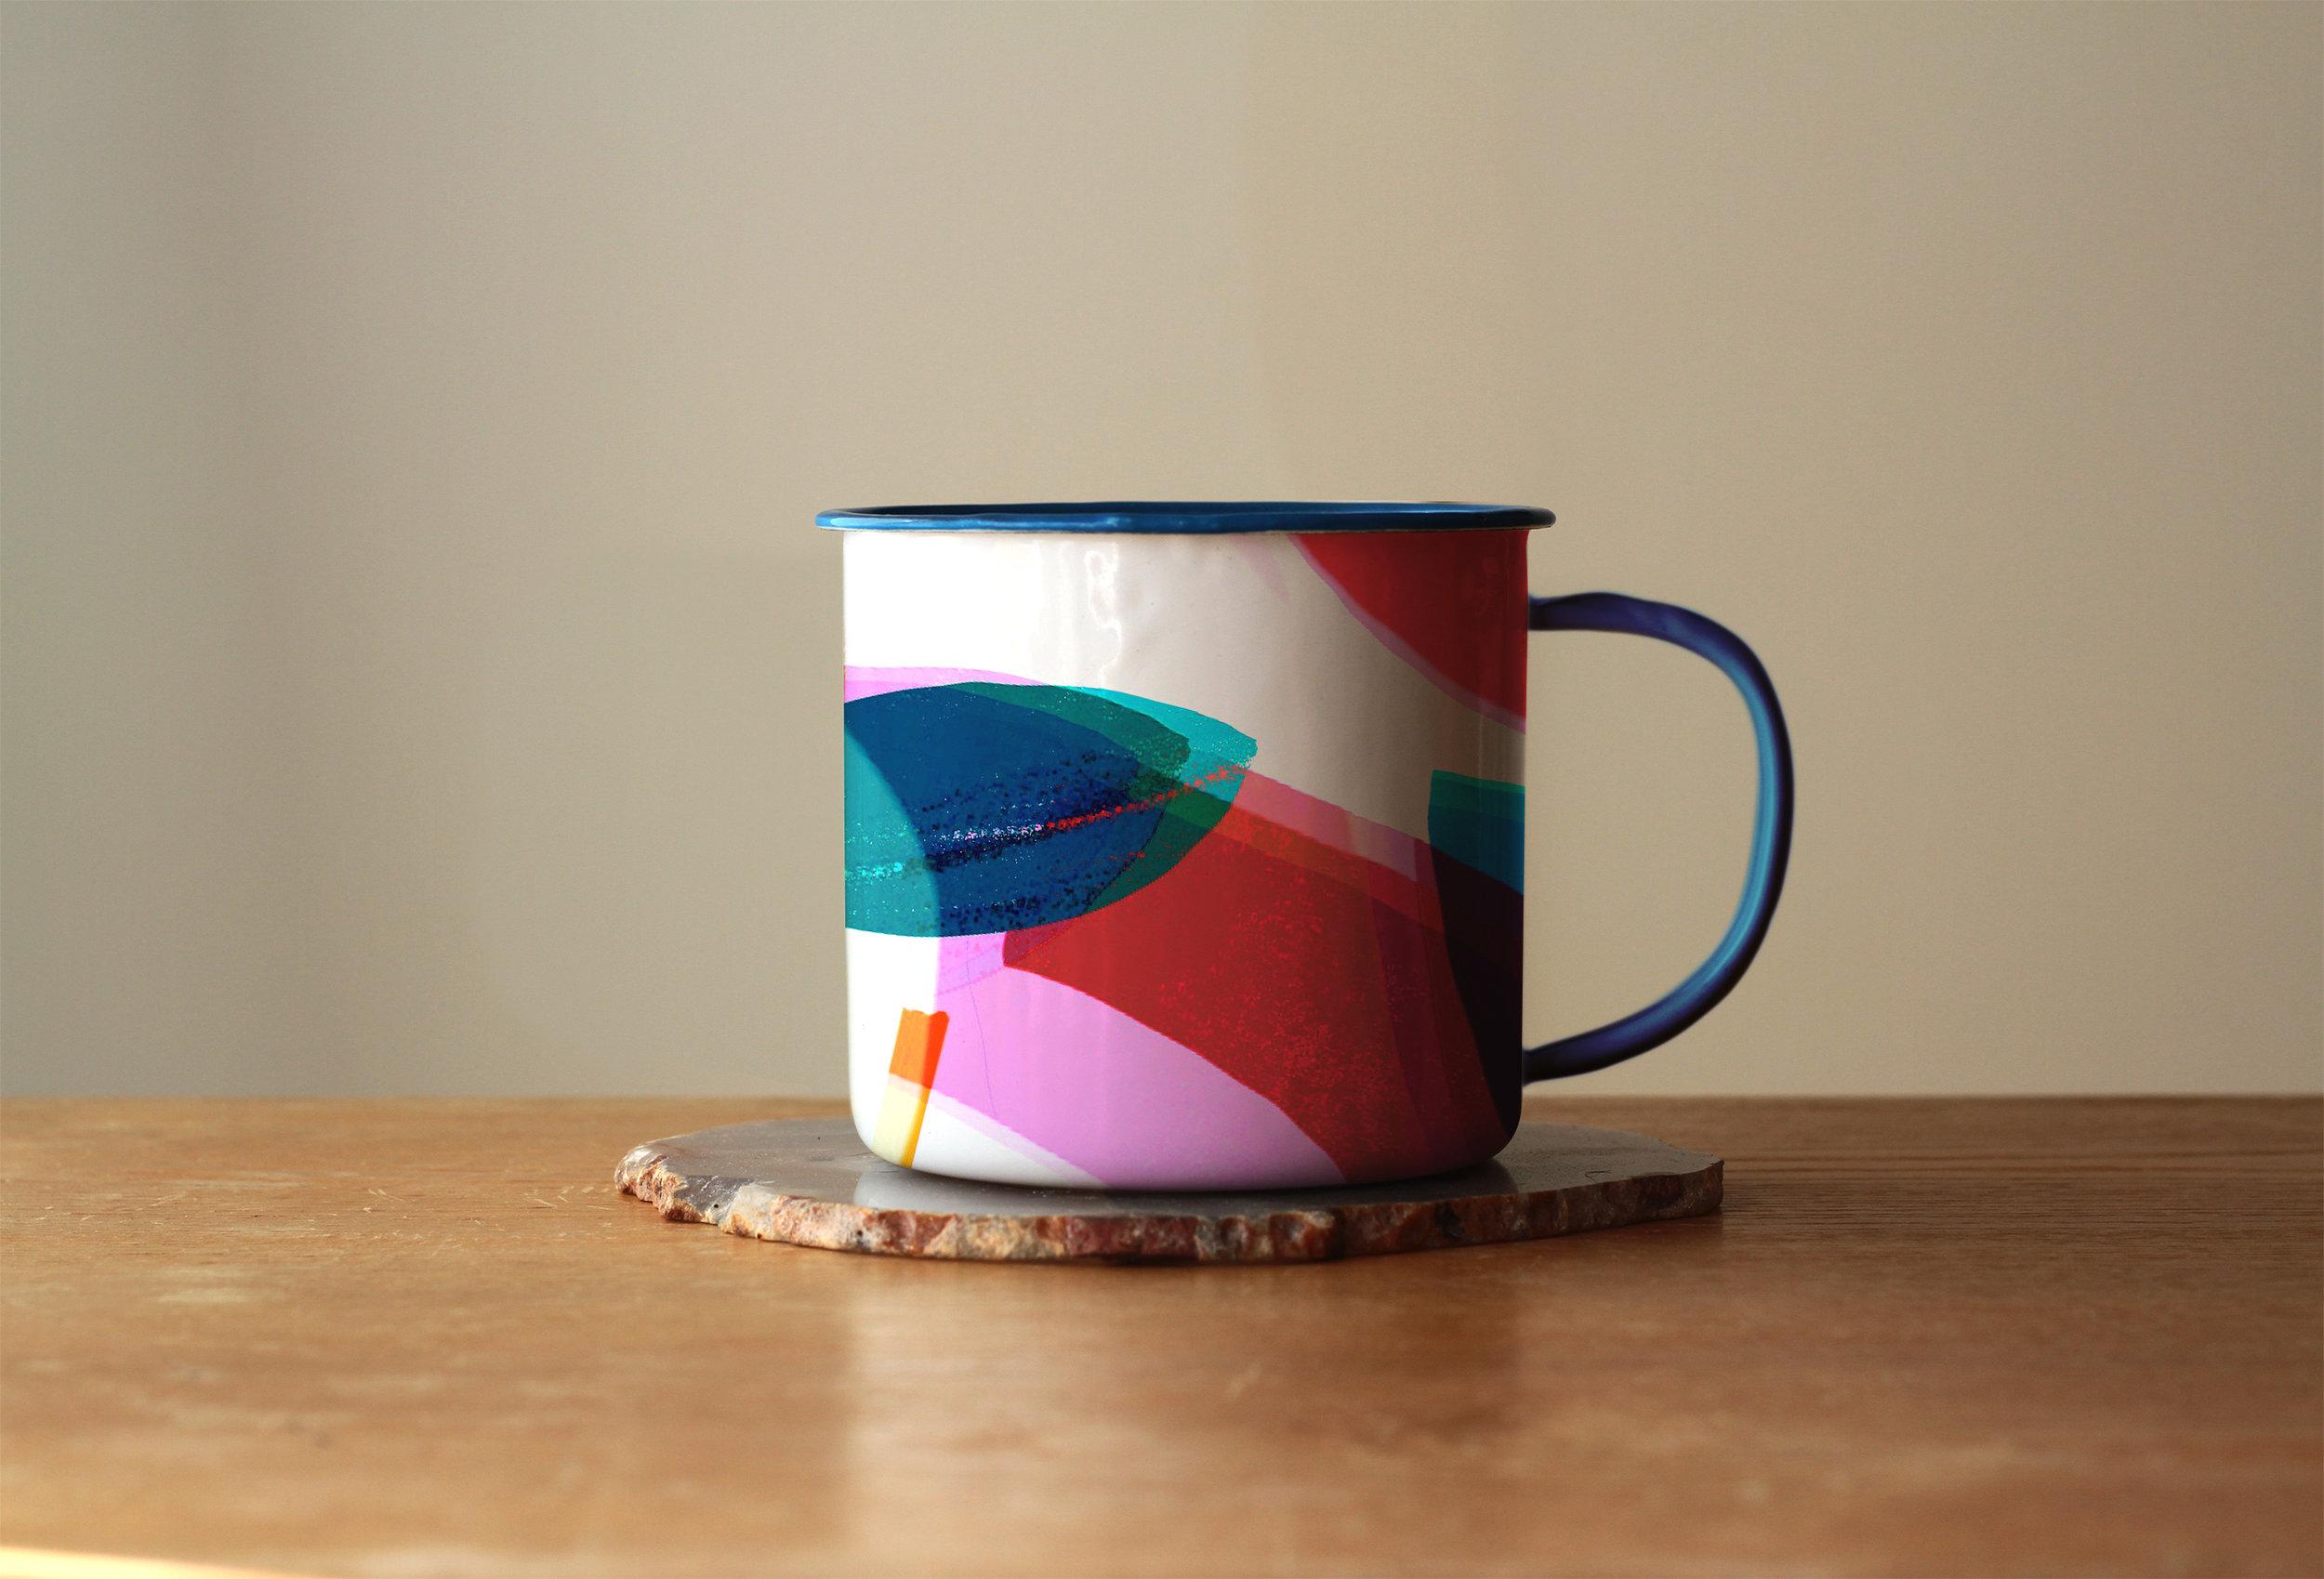 Speculative Summer Mug Design, 2019.